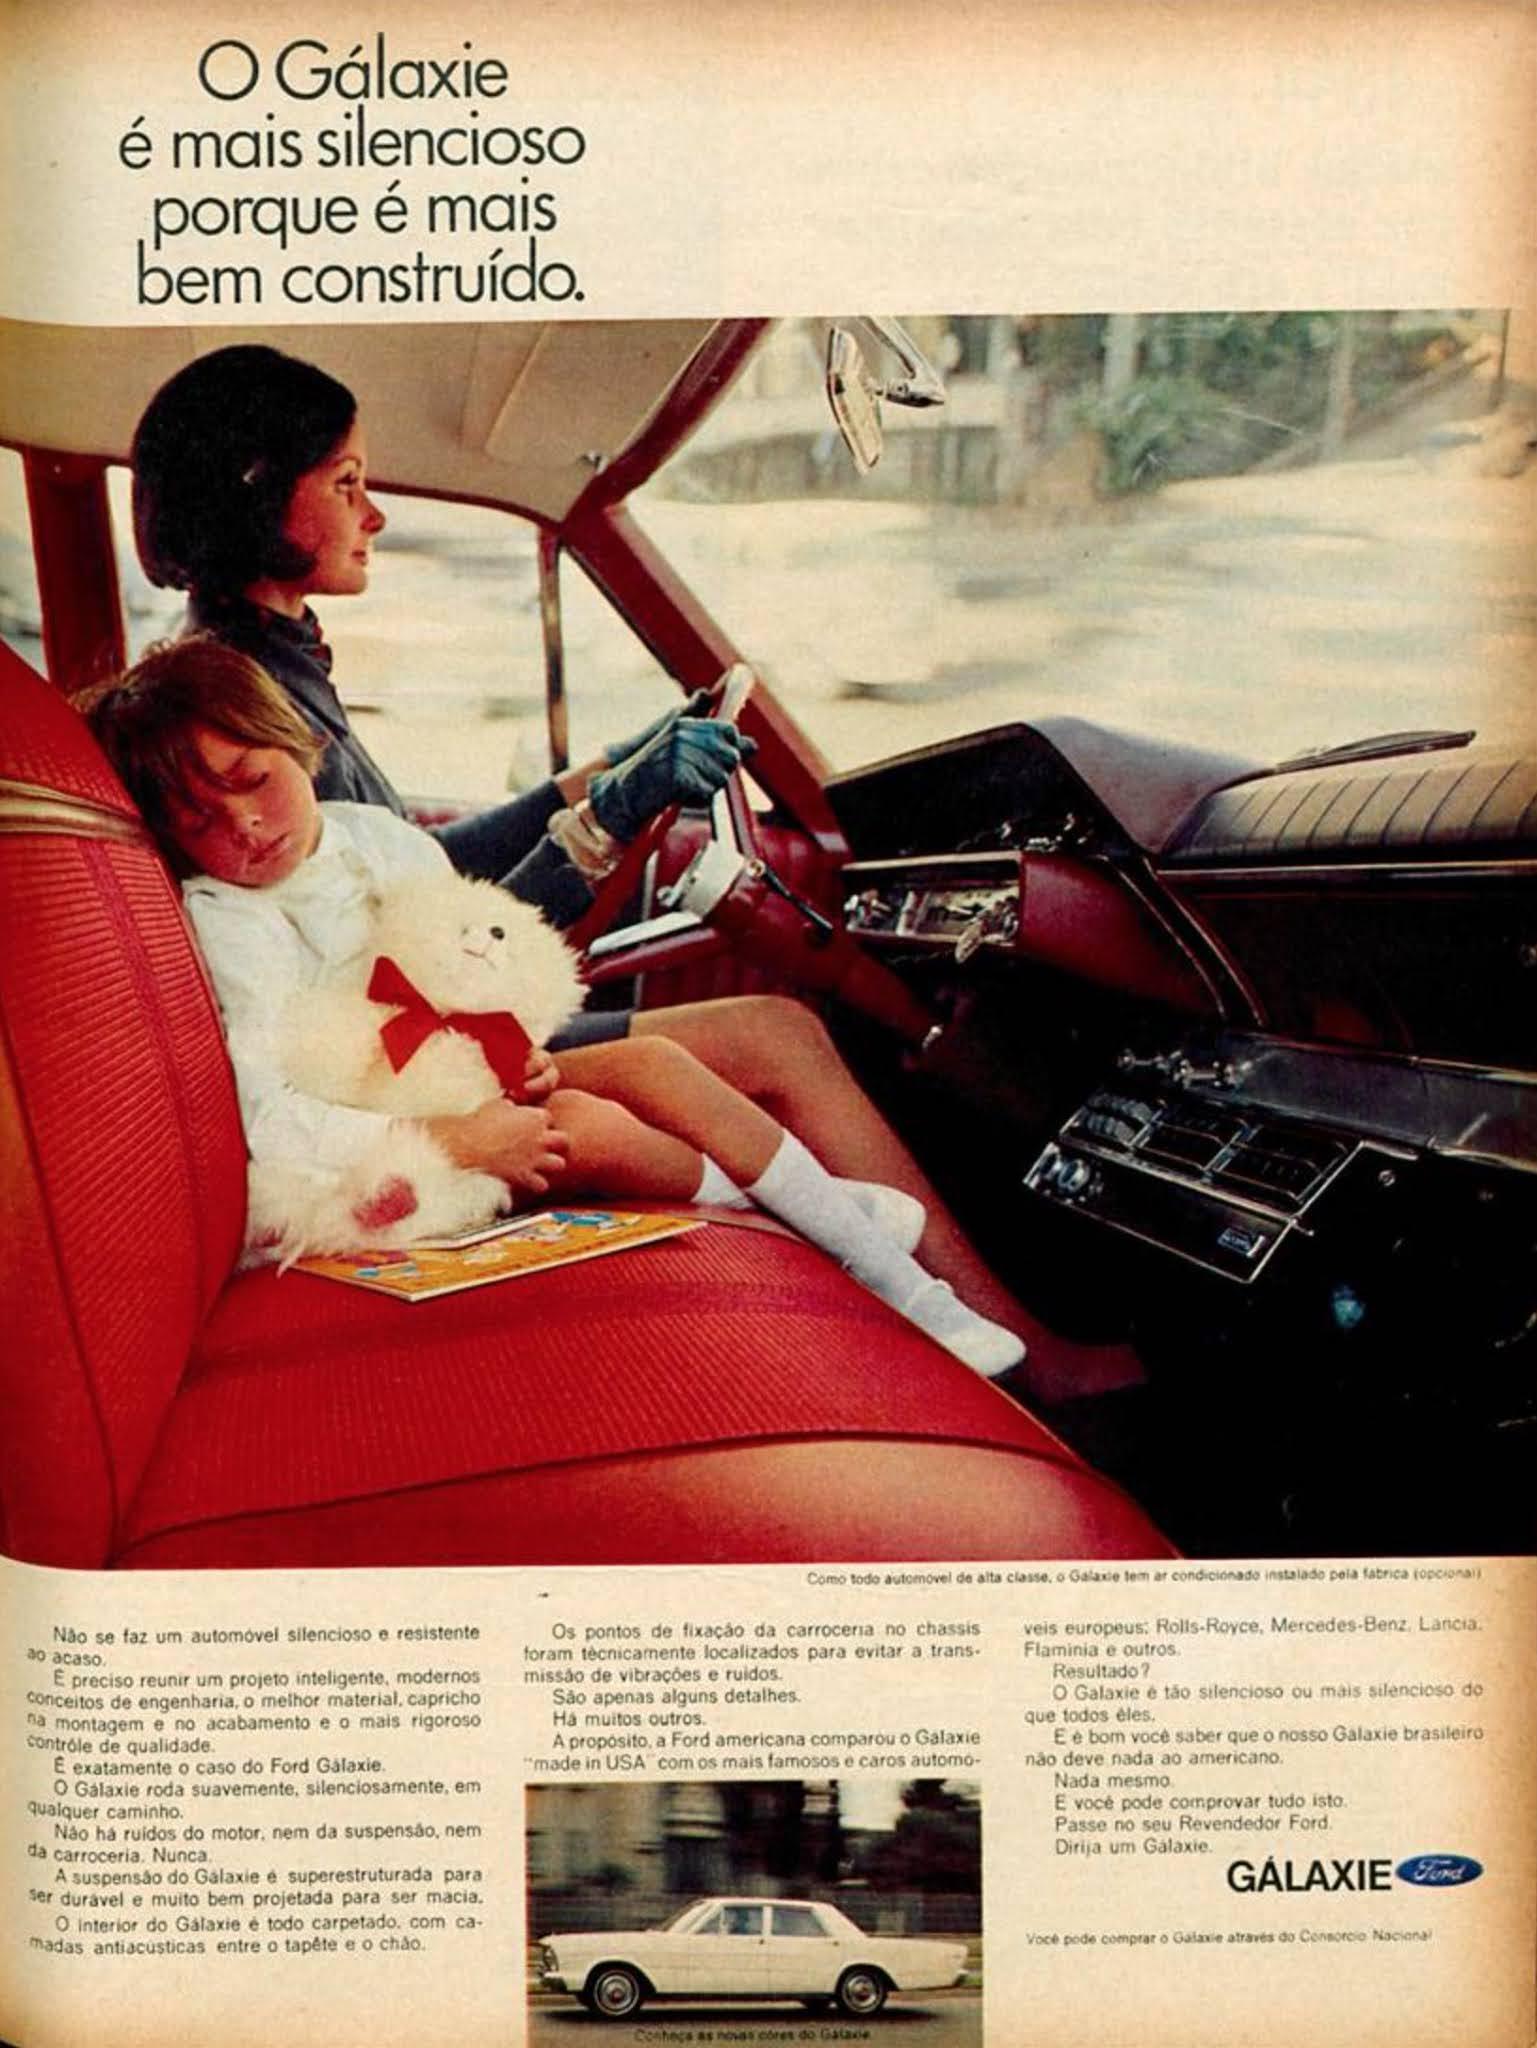 Propaganda da Ford promovendo o Galaxie em 1968